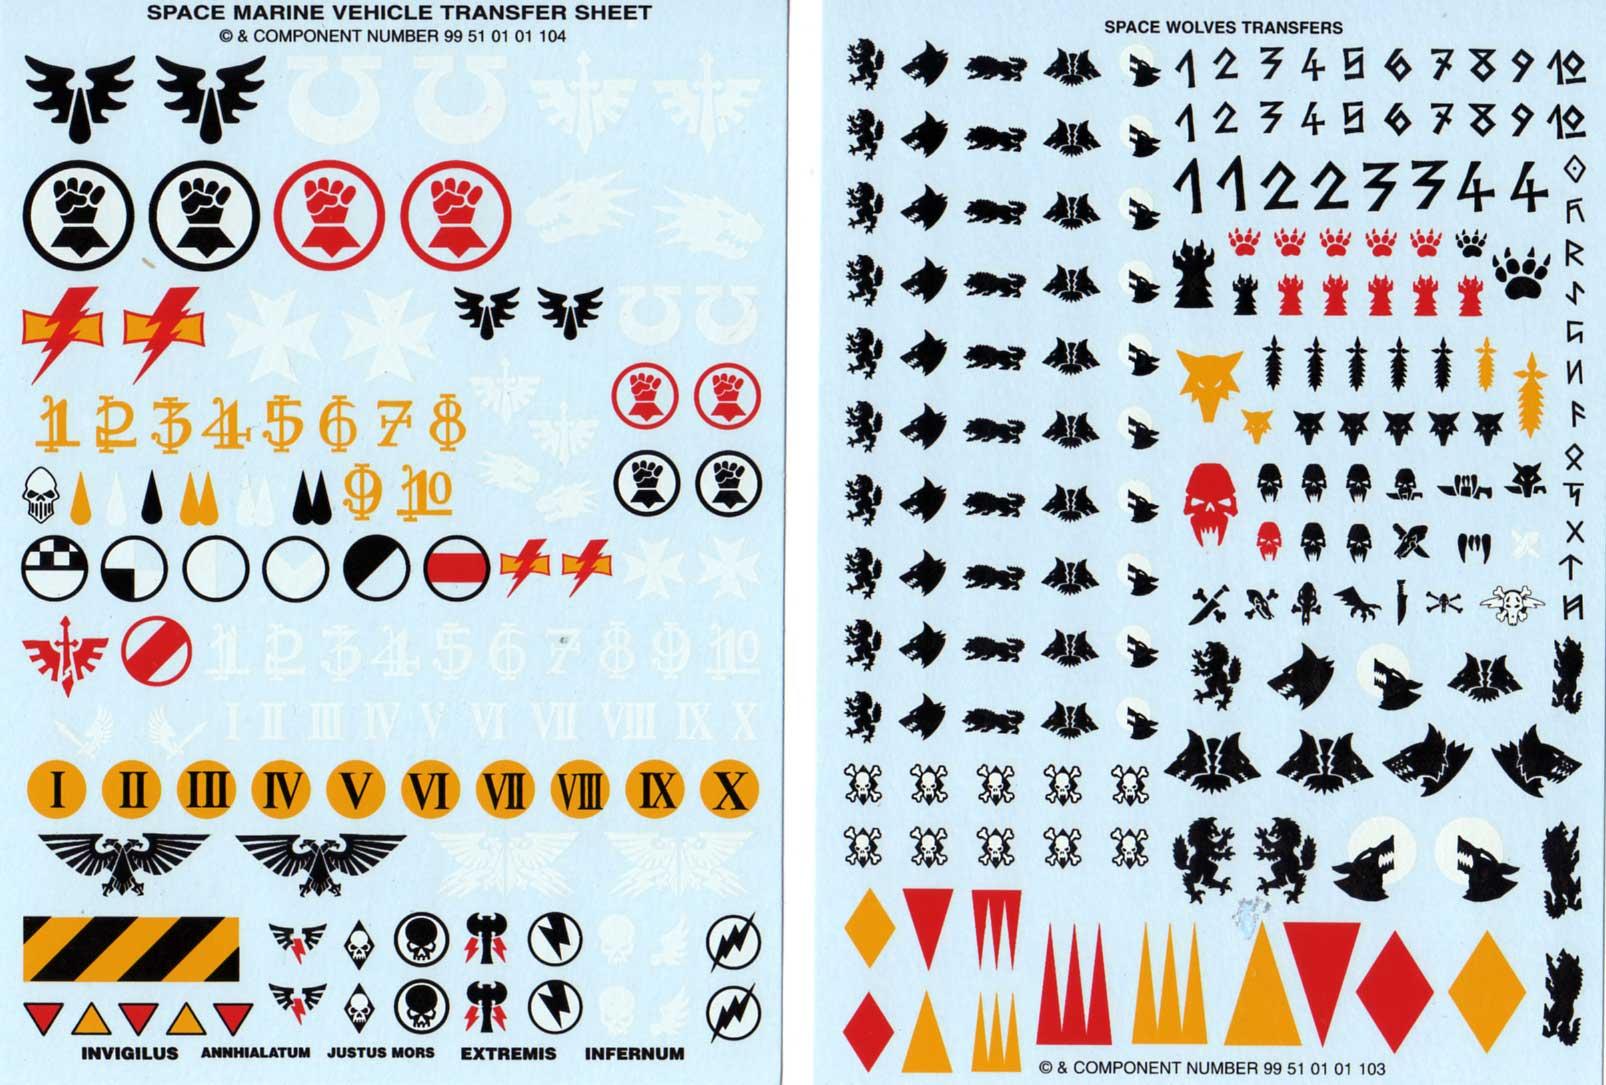 décalco Tank Predator (Space Marine - Warhammer 40.000)